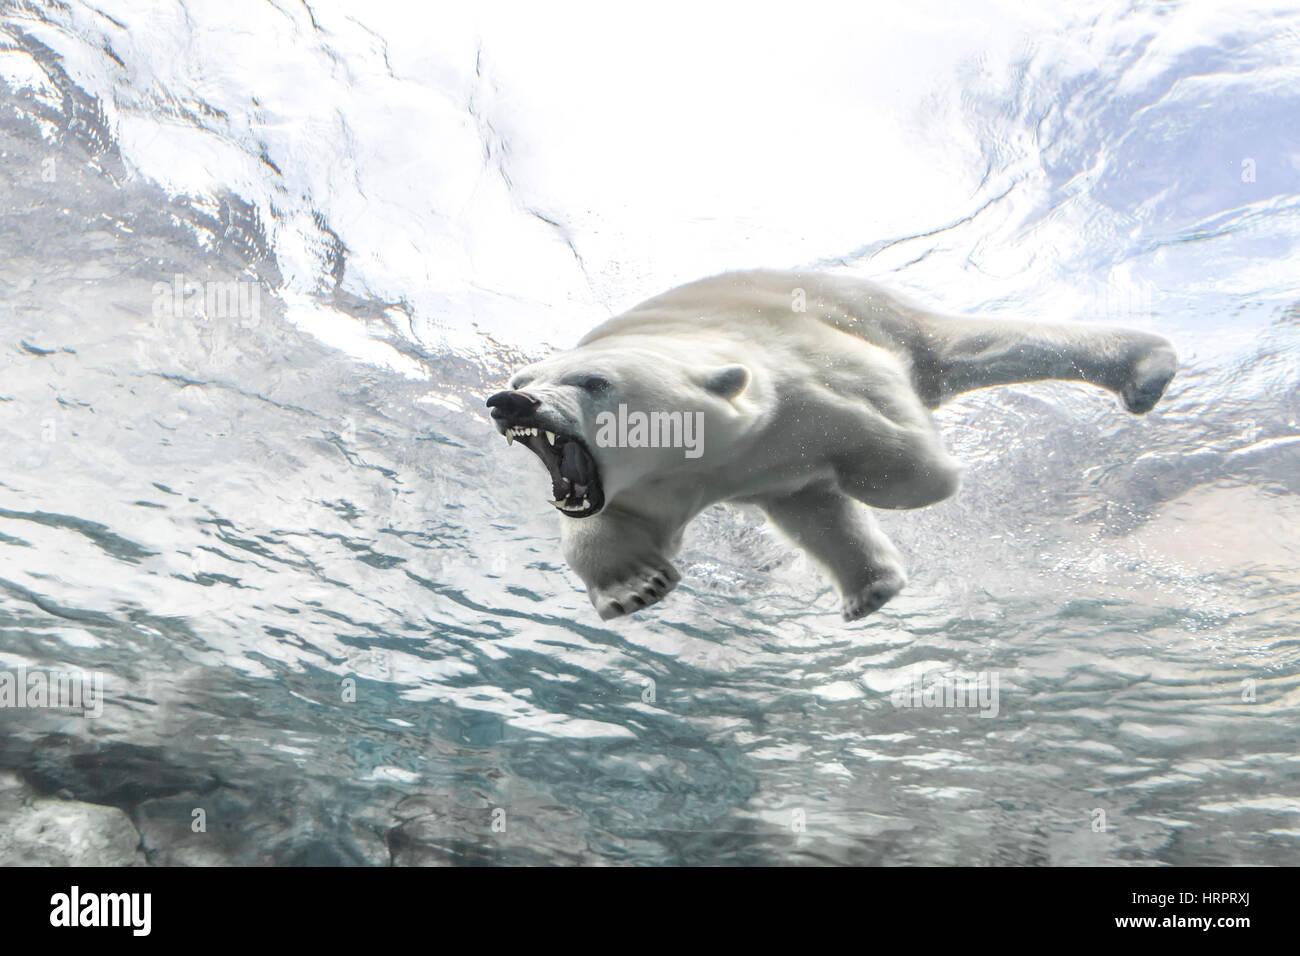 Aggresive Polar Bear at The Journey to Churchill, Assiniboine Park Zoo, Winnipeg, Manitoba, Canada. - Stock Image